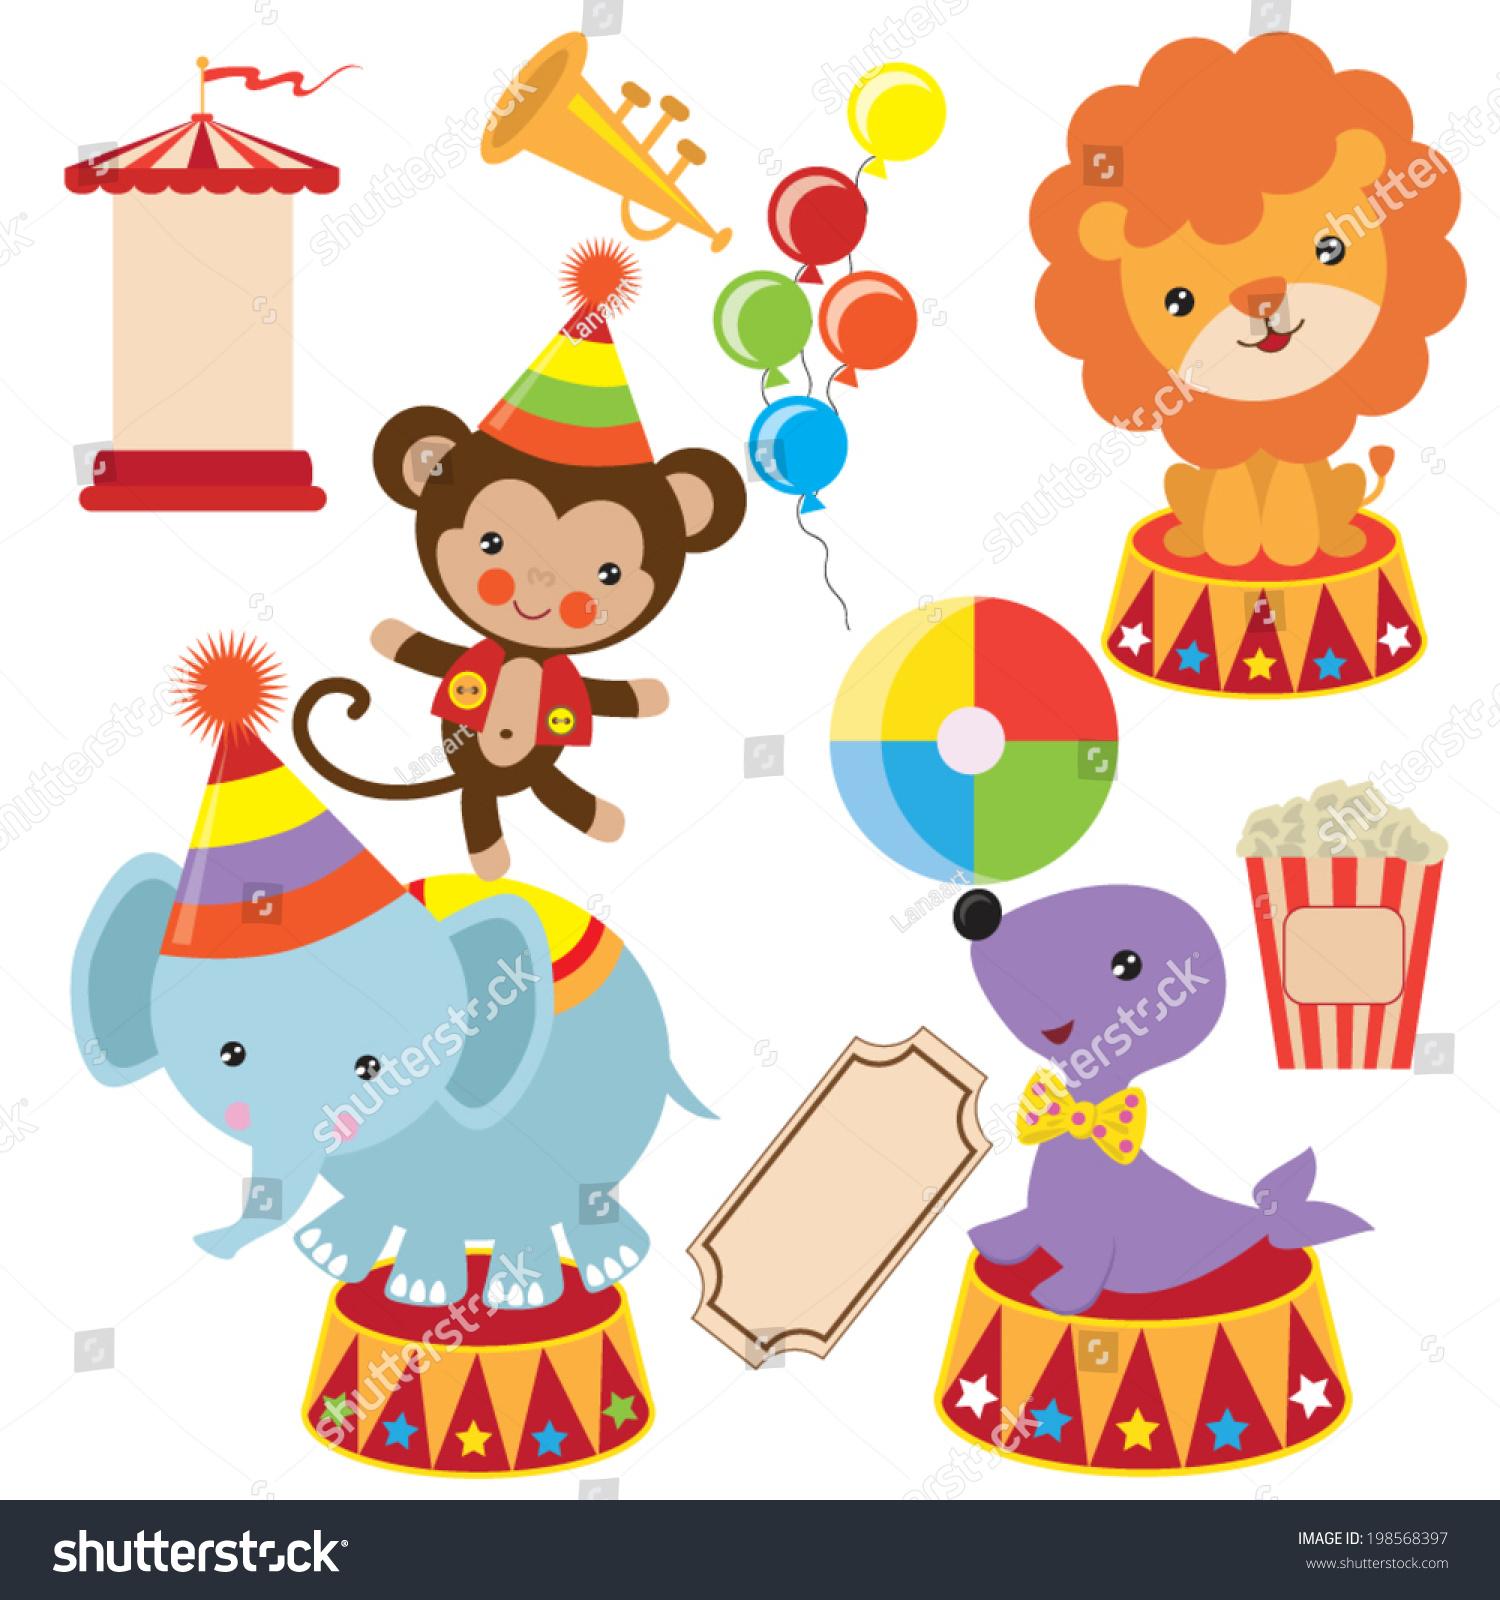 Retro Circus Vector Illustration Stock Vector 198568397 - Shutterstock